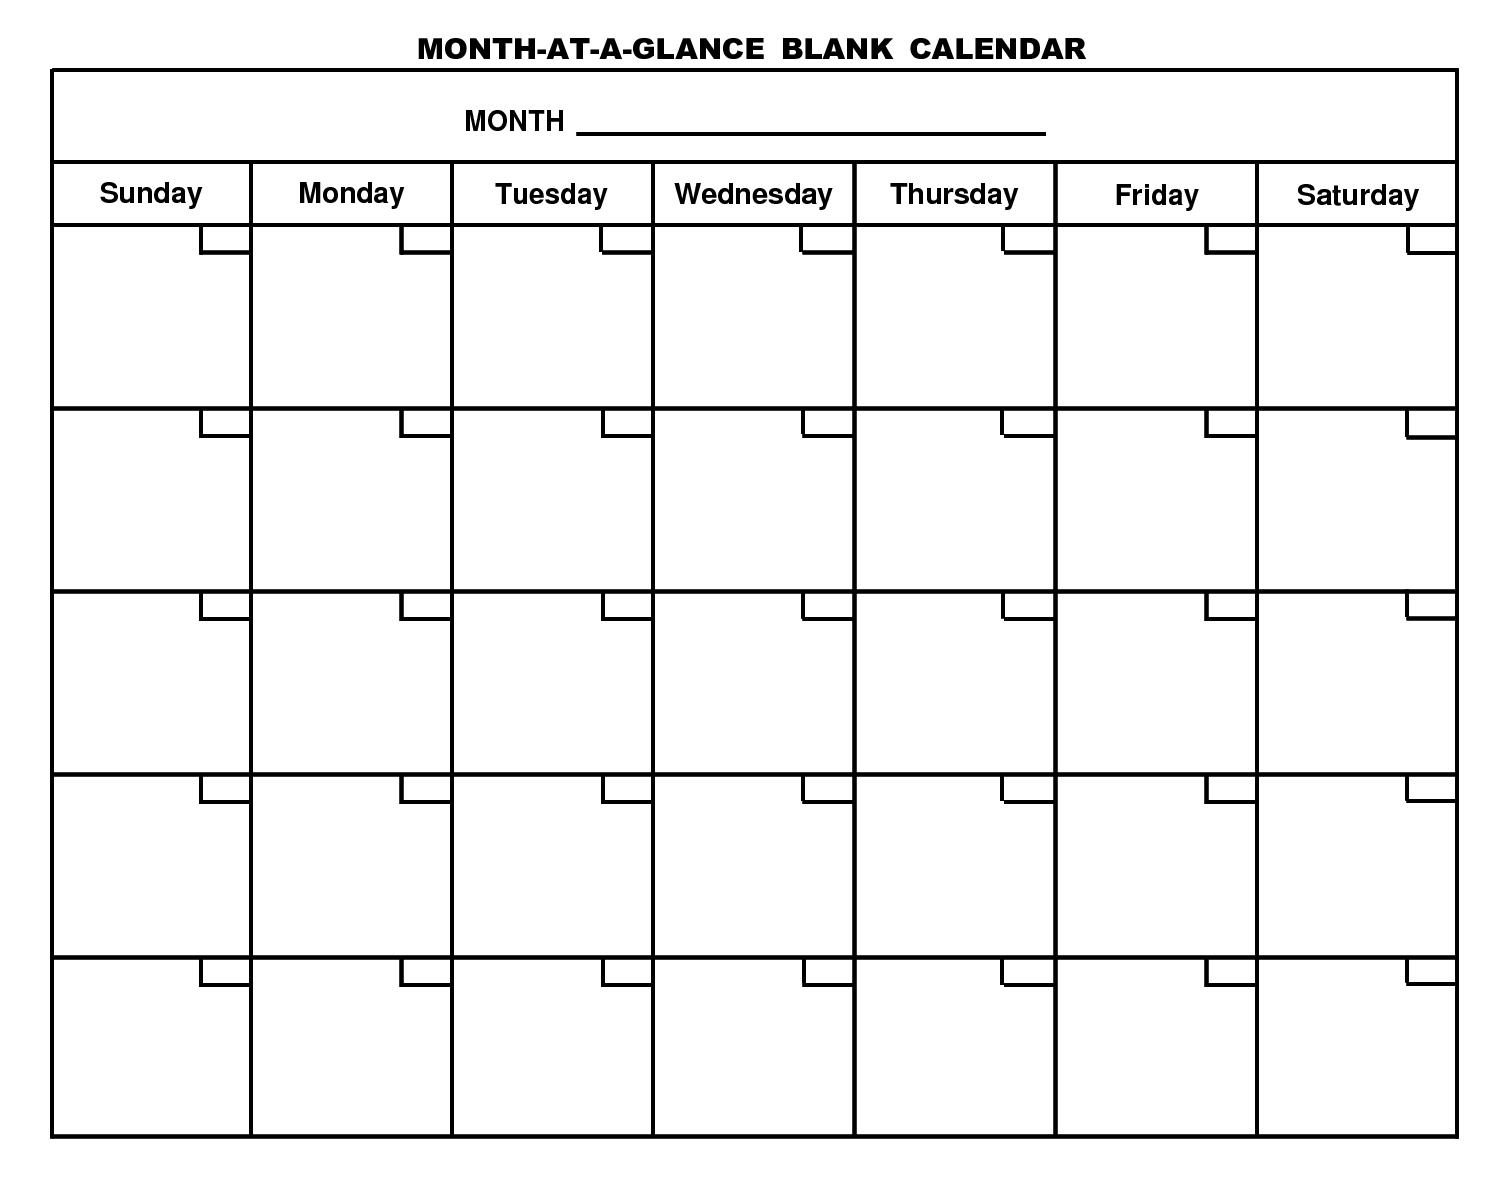 Blank 30 Day Calendar Printable | Isacl